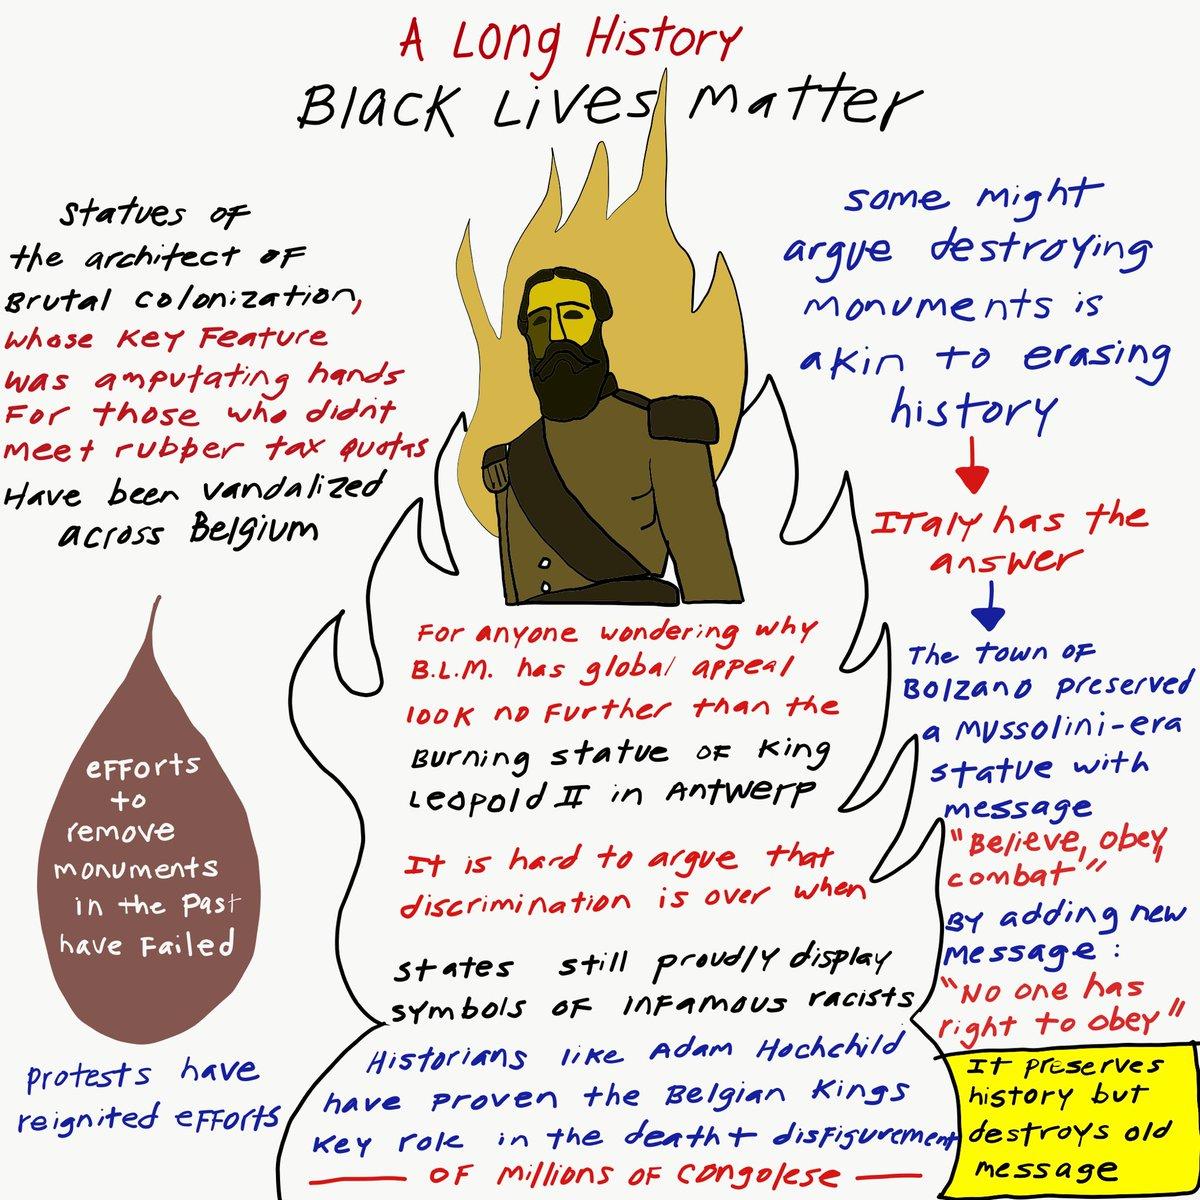 #BlackLivesMatter so #LeopoldMustFall or preserve history by adding context to destroy the #discrimination the king of #Belgique #Belgium stood for in #DRCongo https://t.co/nFna8GkG0o